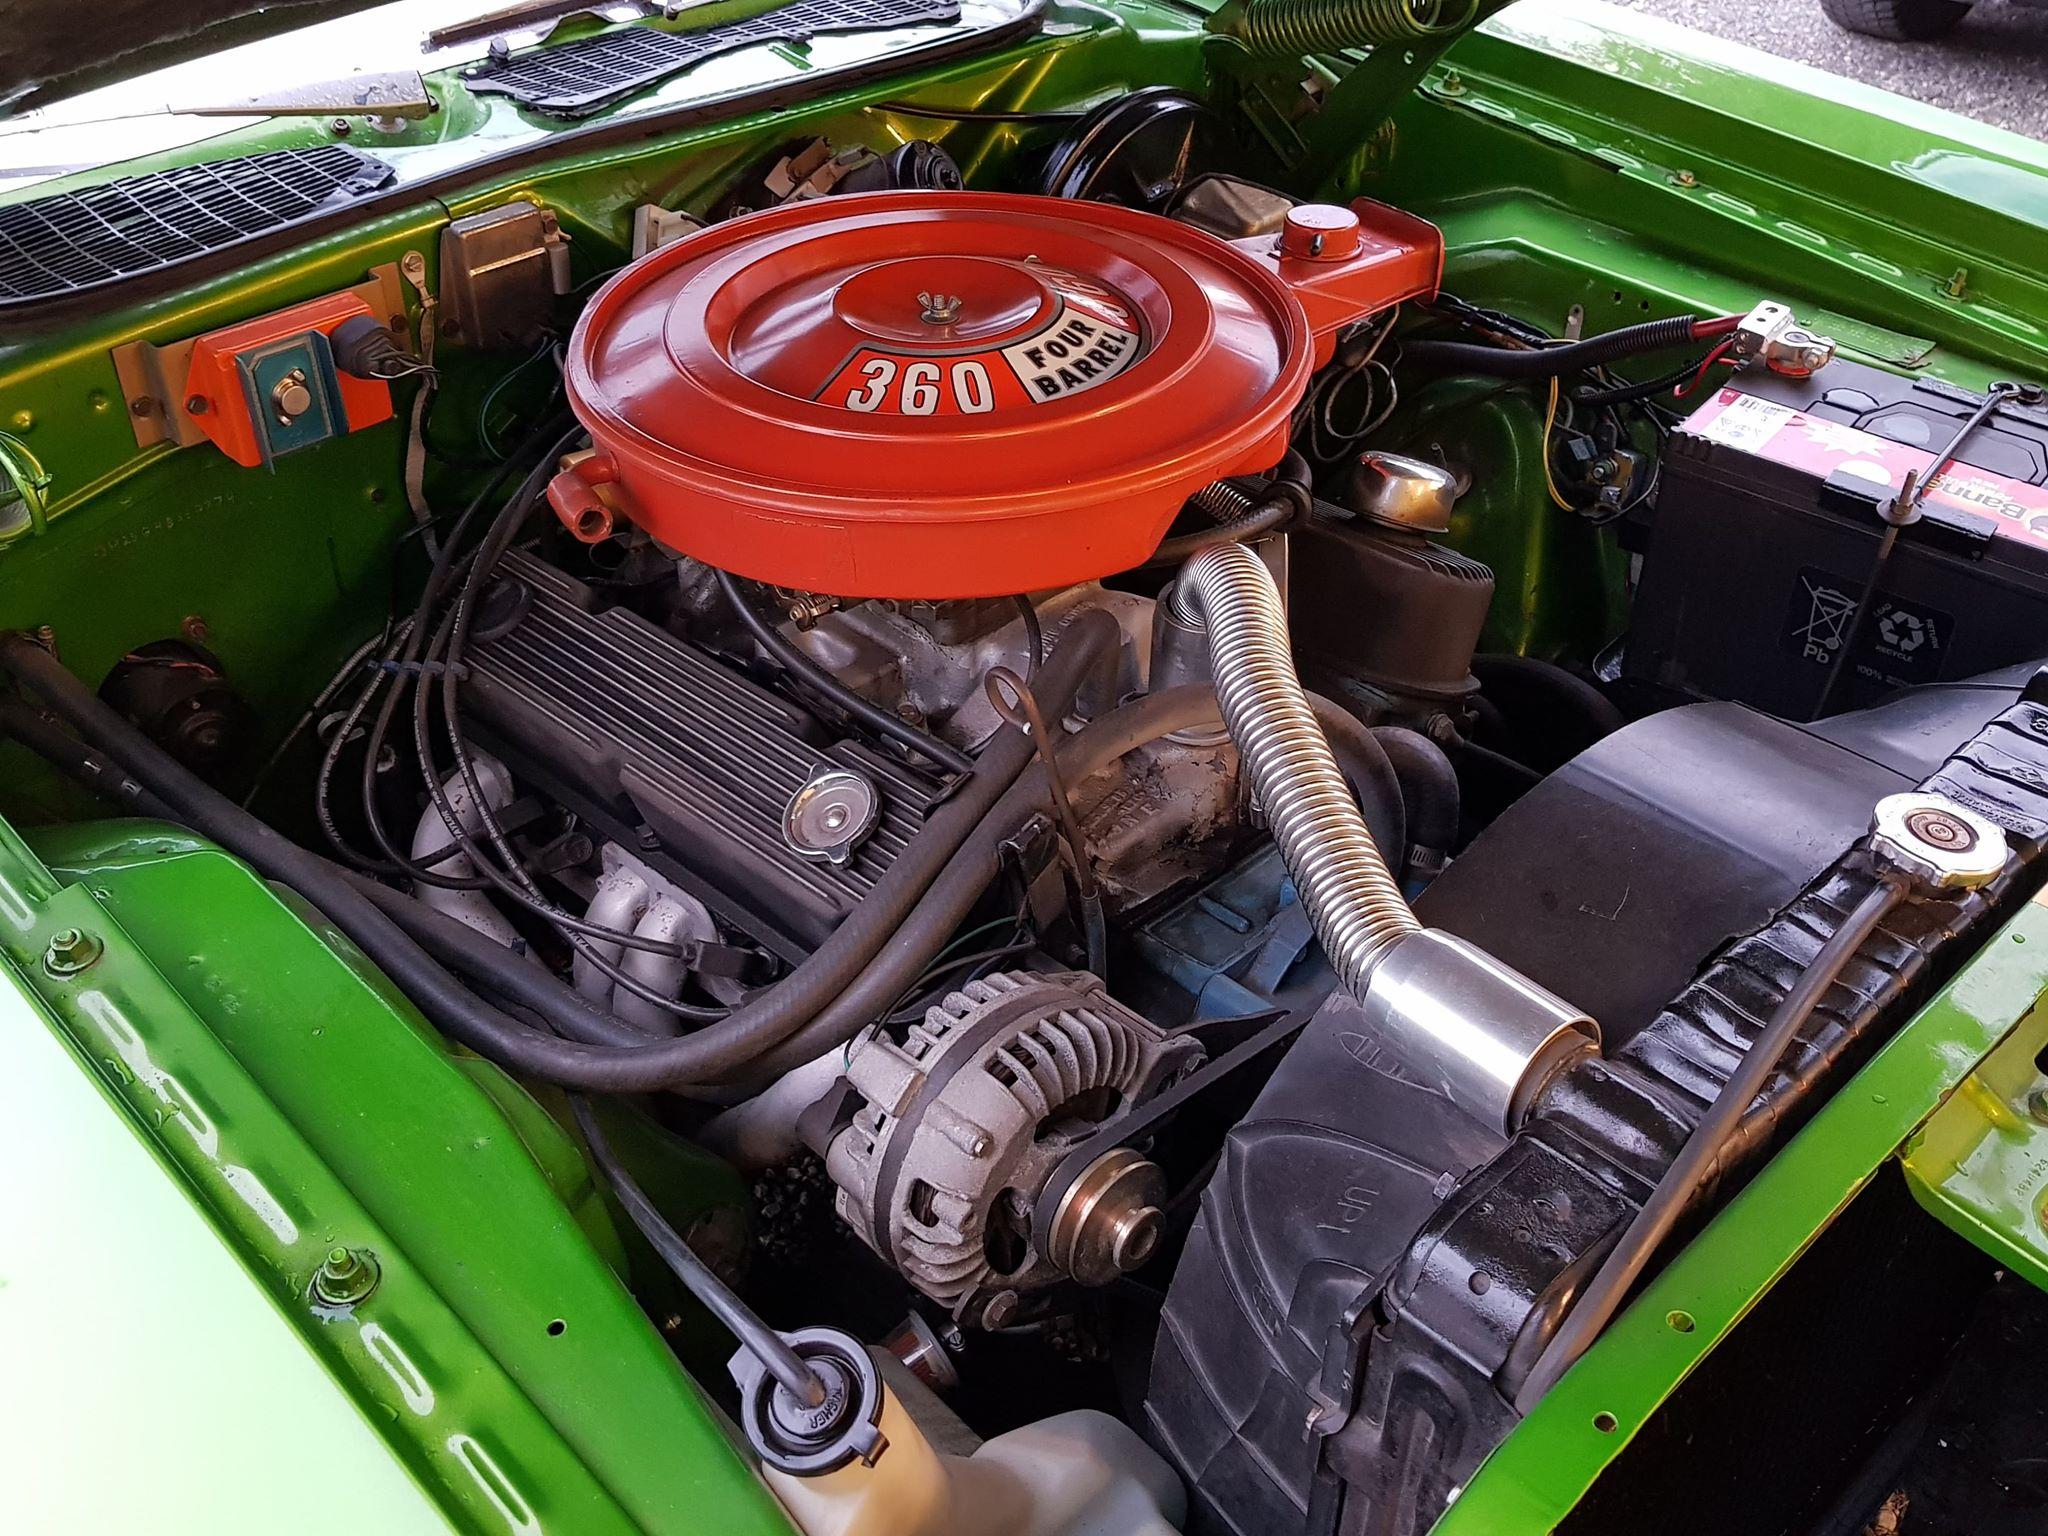 Ny motor på plass. Det er byttet fra den originale 318 til 360 med Edelbrock-forgasser.